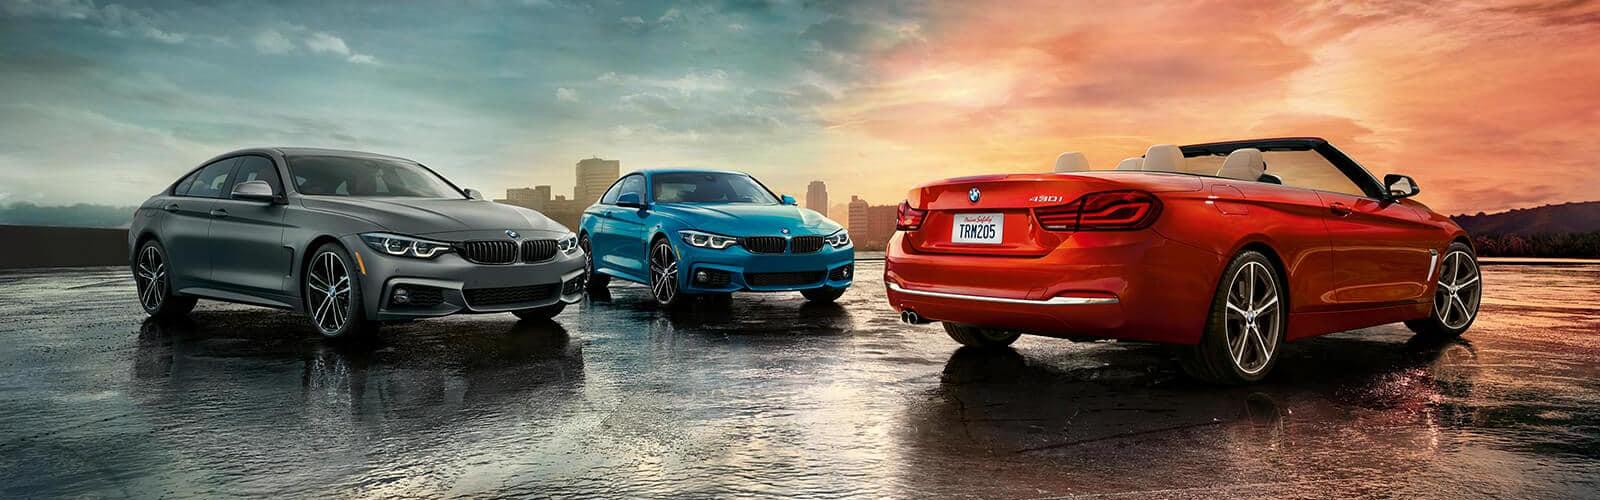 three beautiful BMWs with sun setting behind